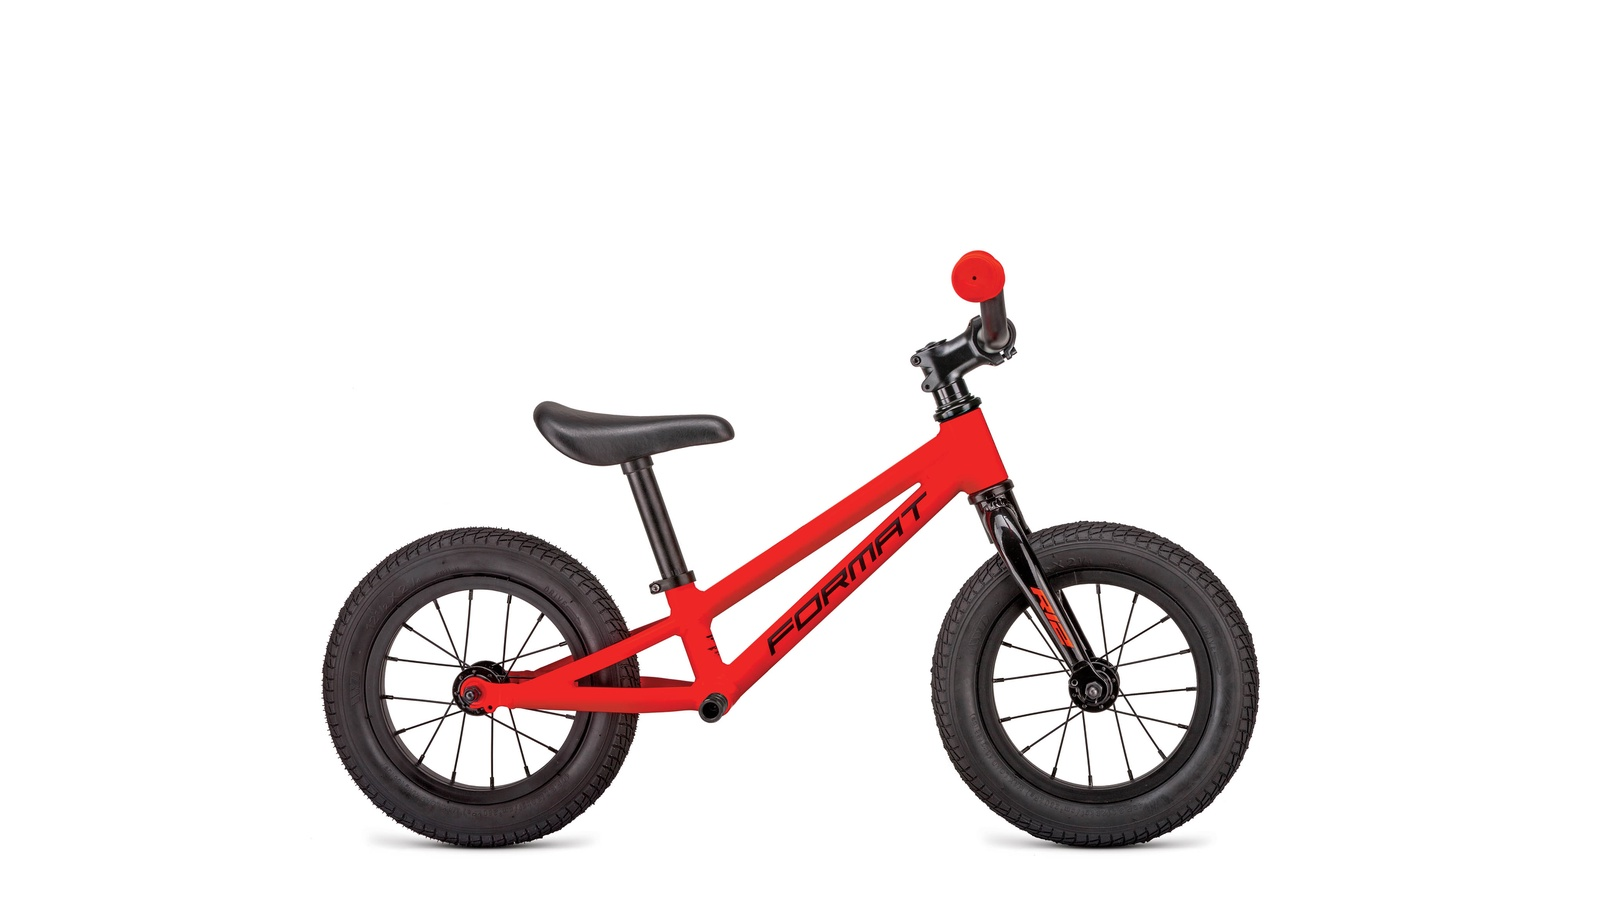 Format Runbike 2019 onro велосипед детский onro by runbike диаметр колес 16